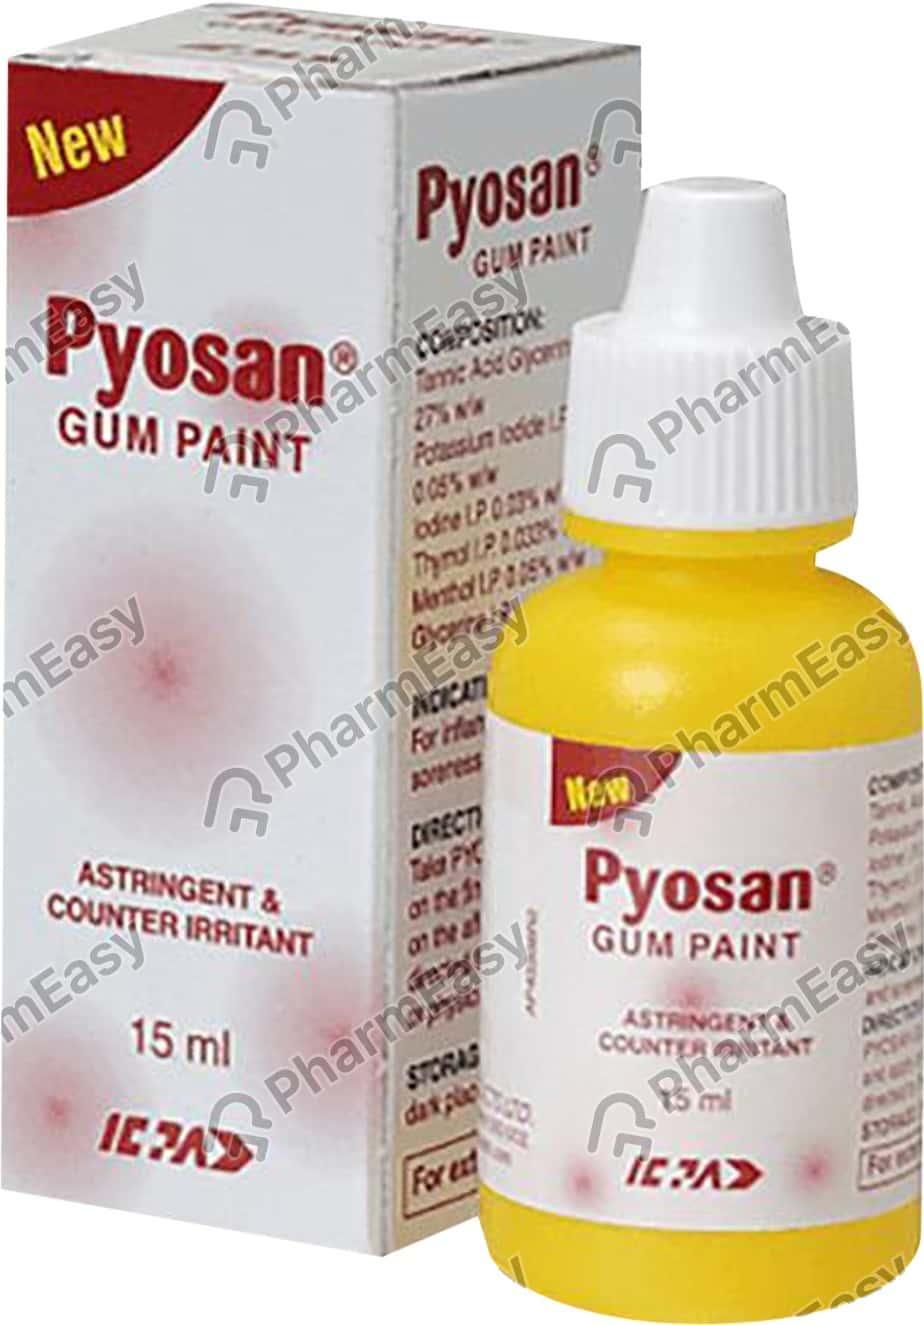 New Pyosan Gum Paint 15ml